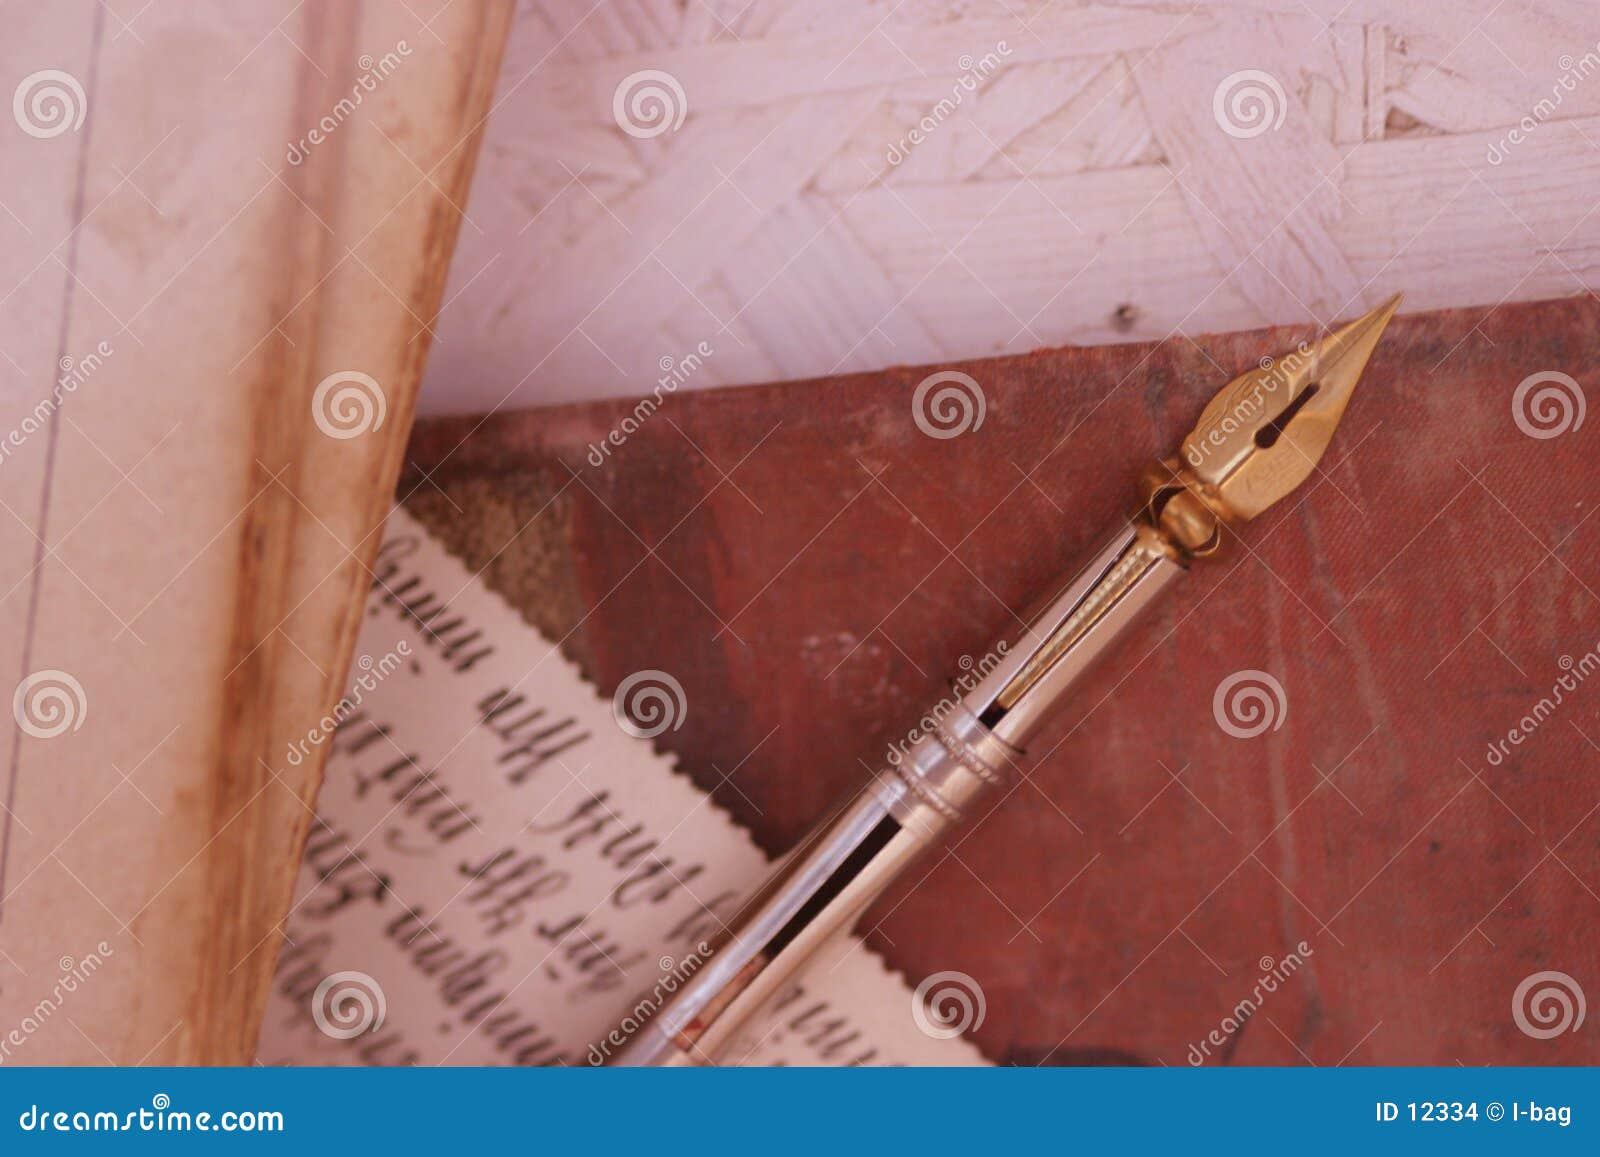 Old pencil & handwriting